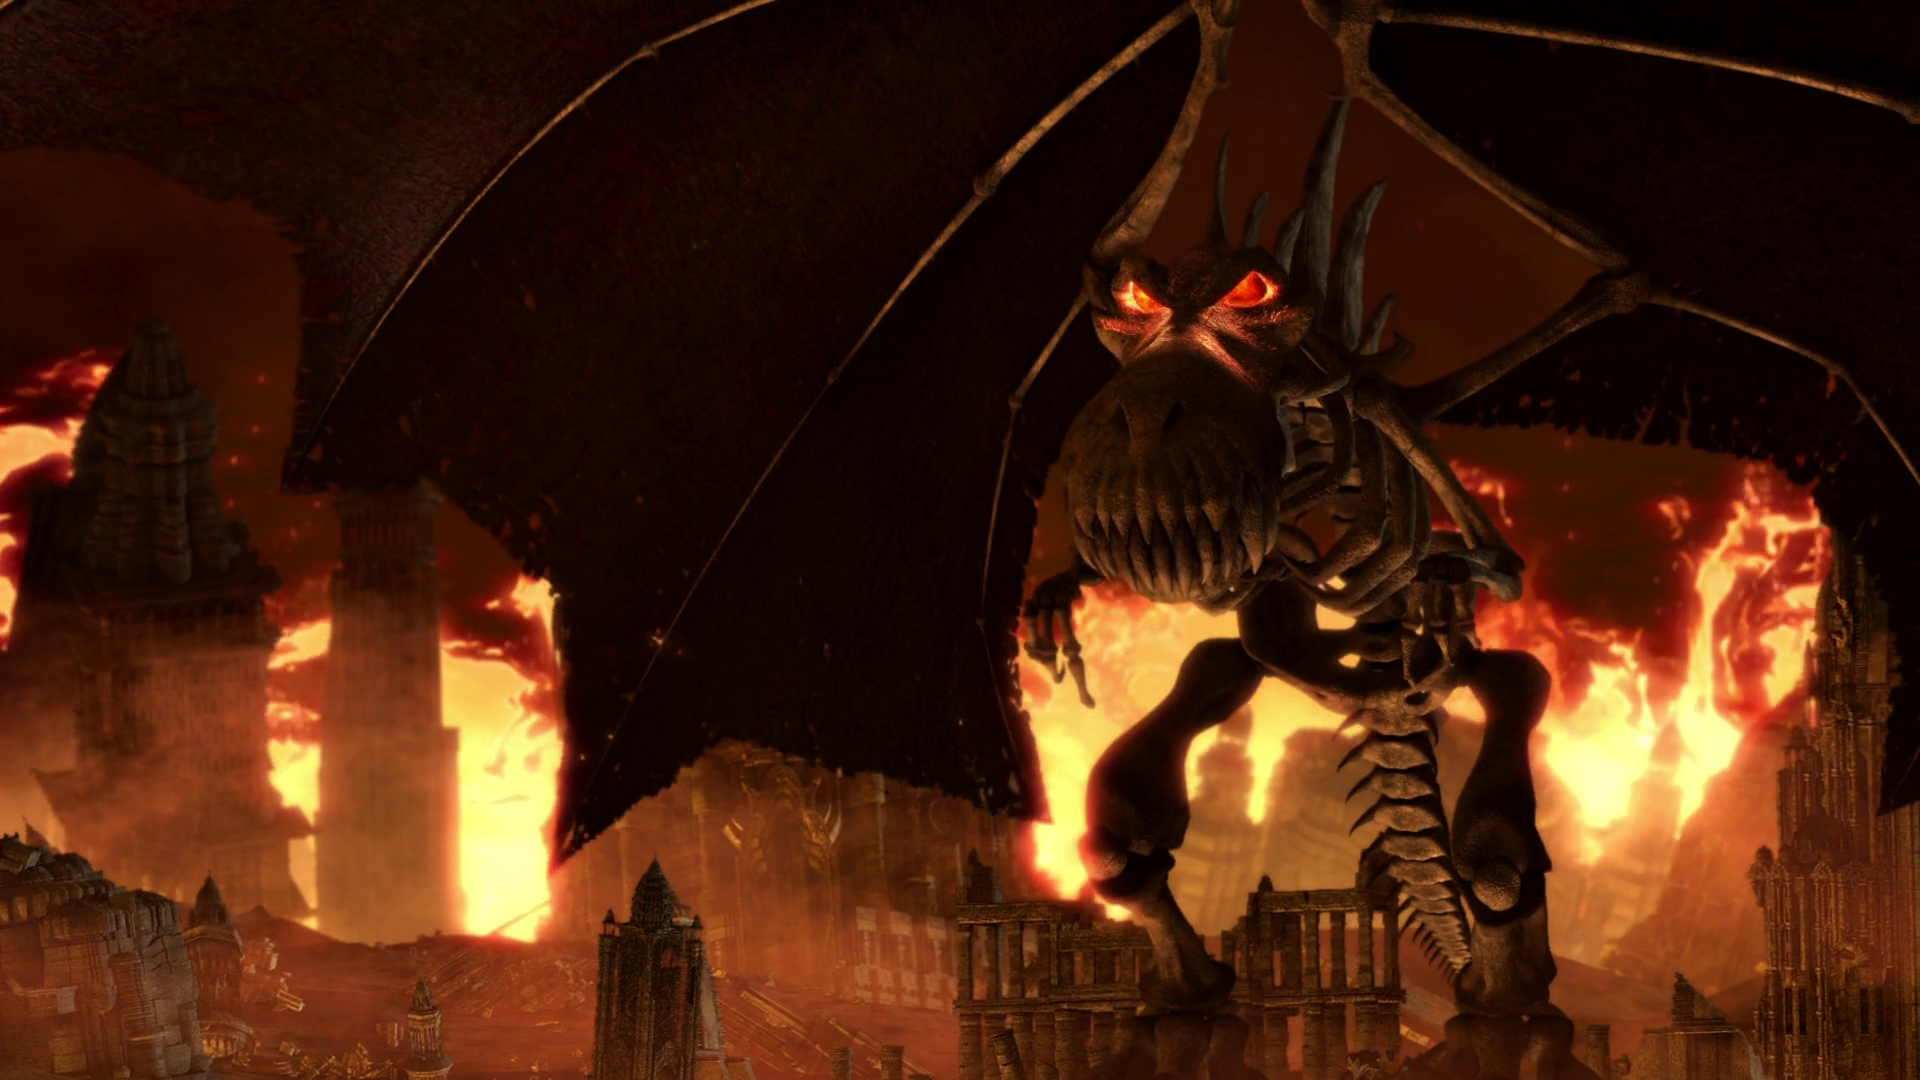 Dragon Hunters HD Wallpaper Background Image 1920x1080 ID 1920x1080